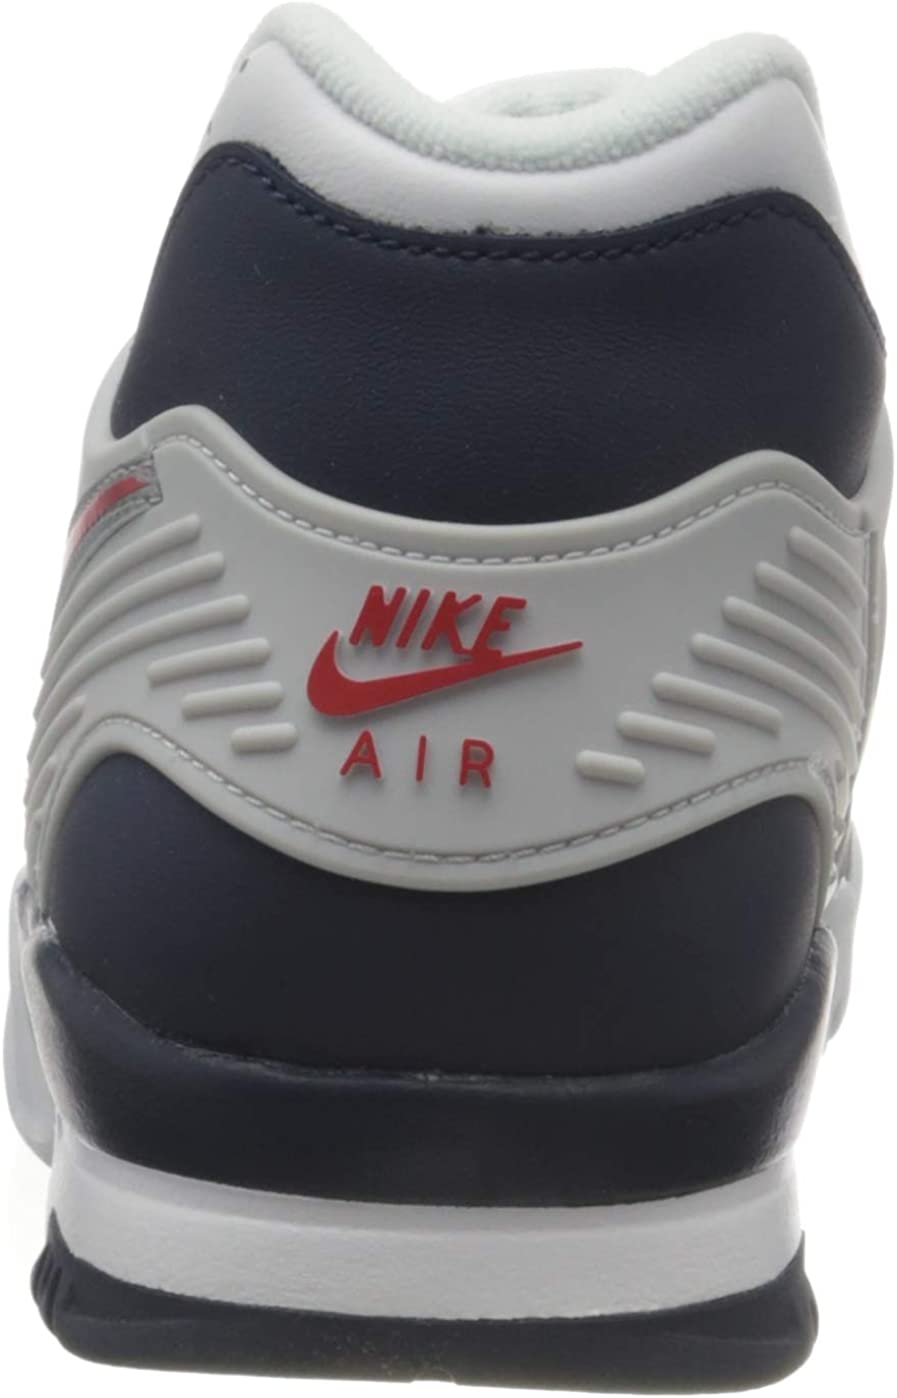 NIKE Air Trainer 3 Zapatillas de b/ásquetbol Hombre